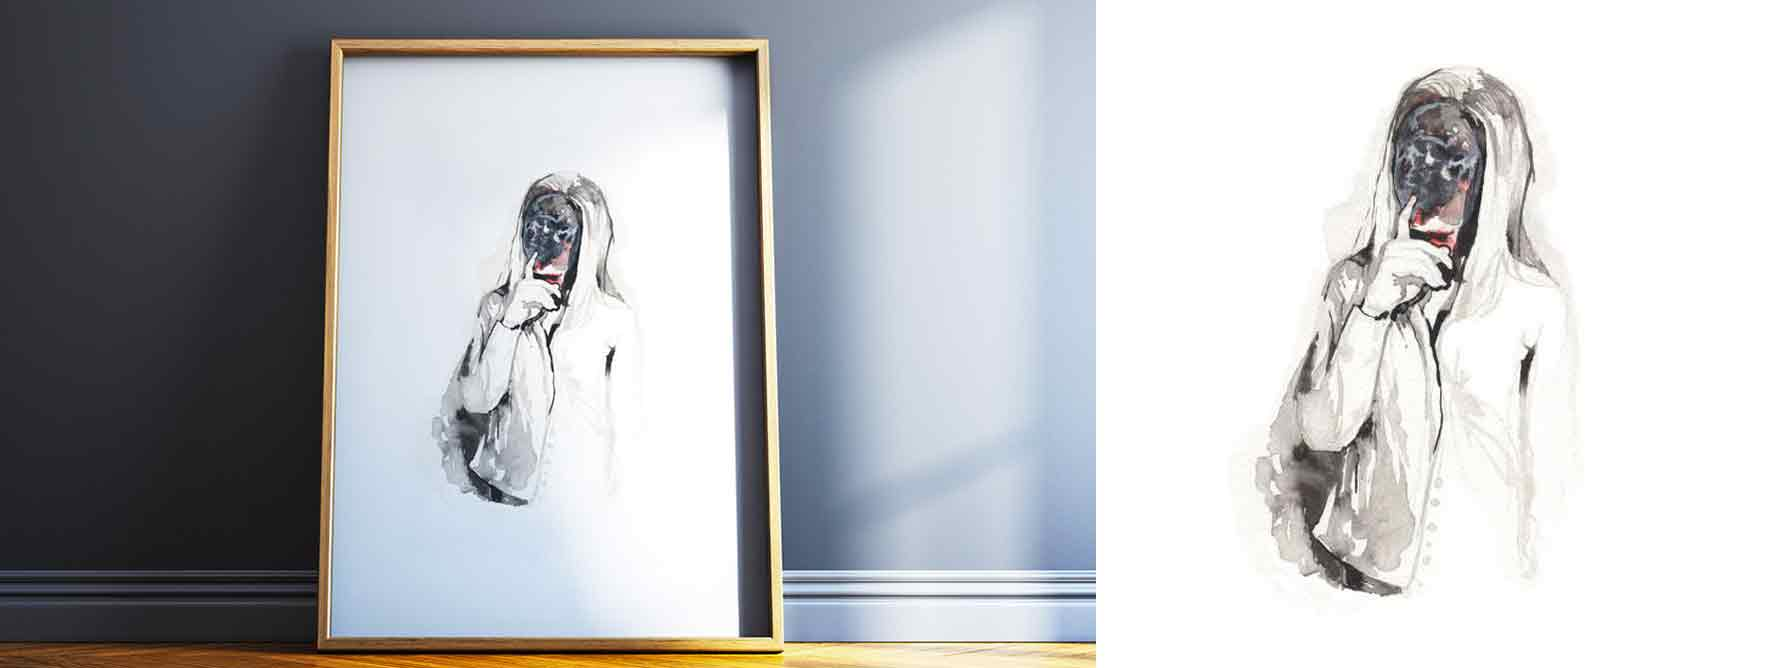 professiona1 photographe13a - ۹۹ روش برای فروش آثار هنری